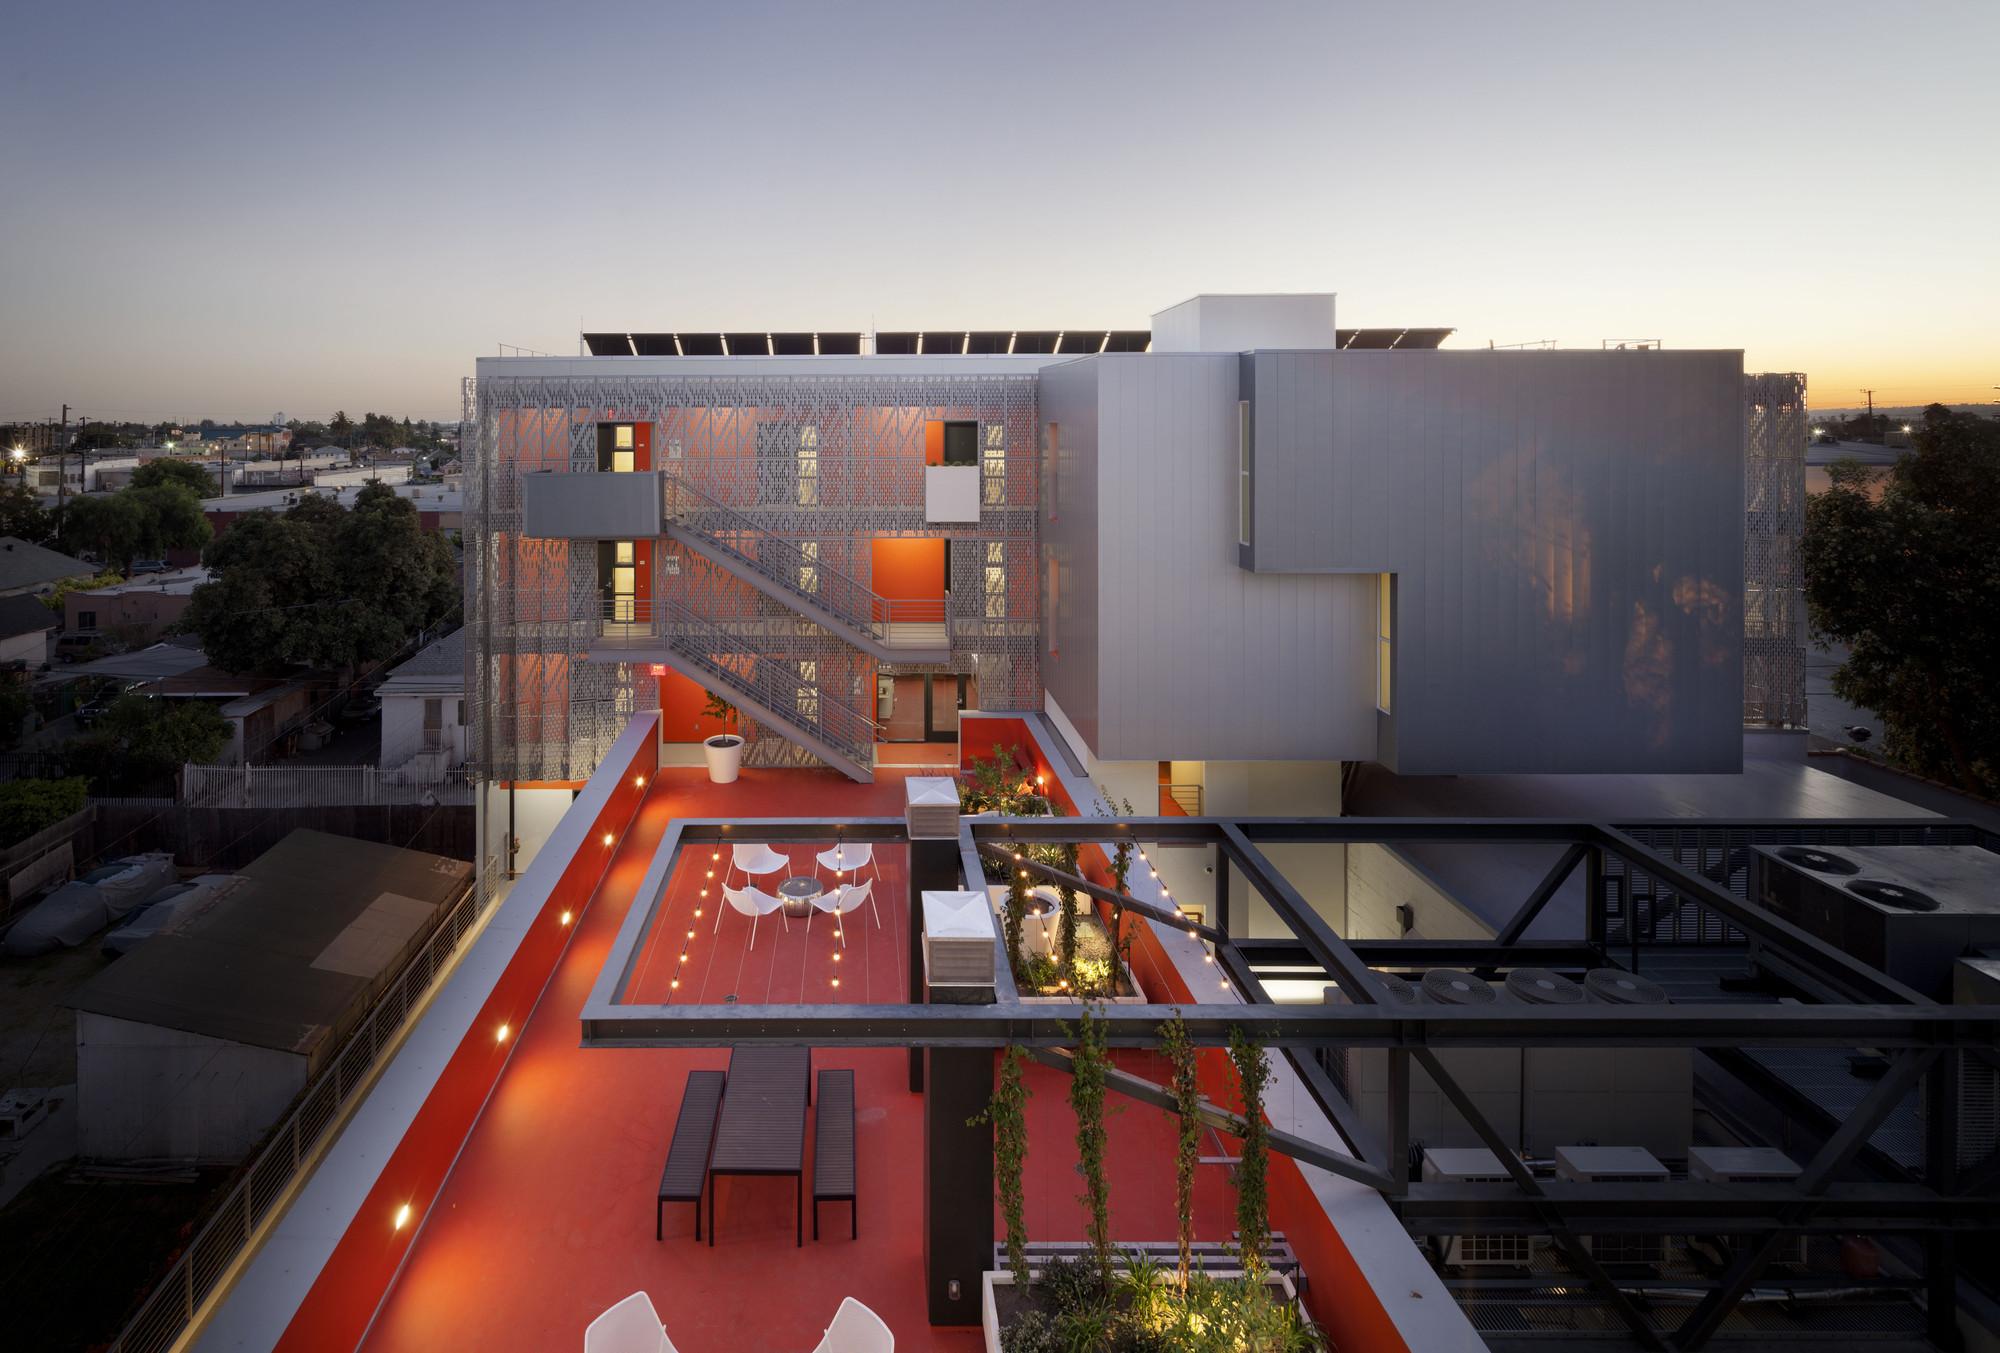 Housing winner: 28thStreet Apartments, USA by Koning Eizenberg Architecture, Inc